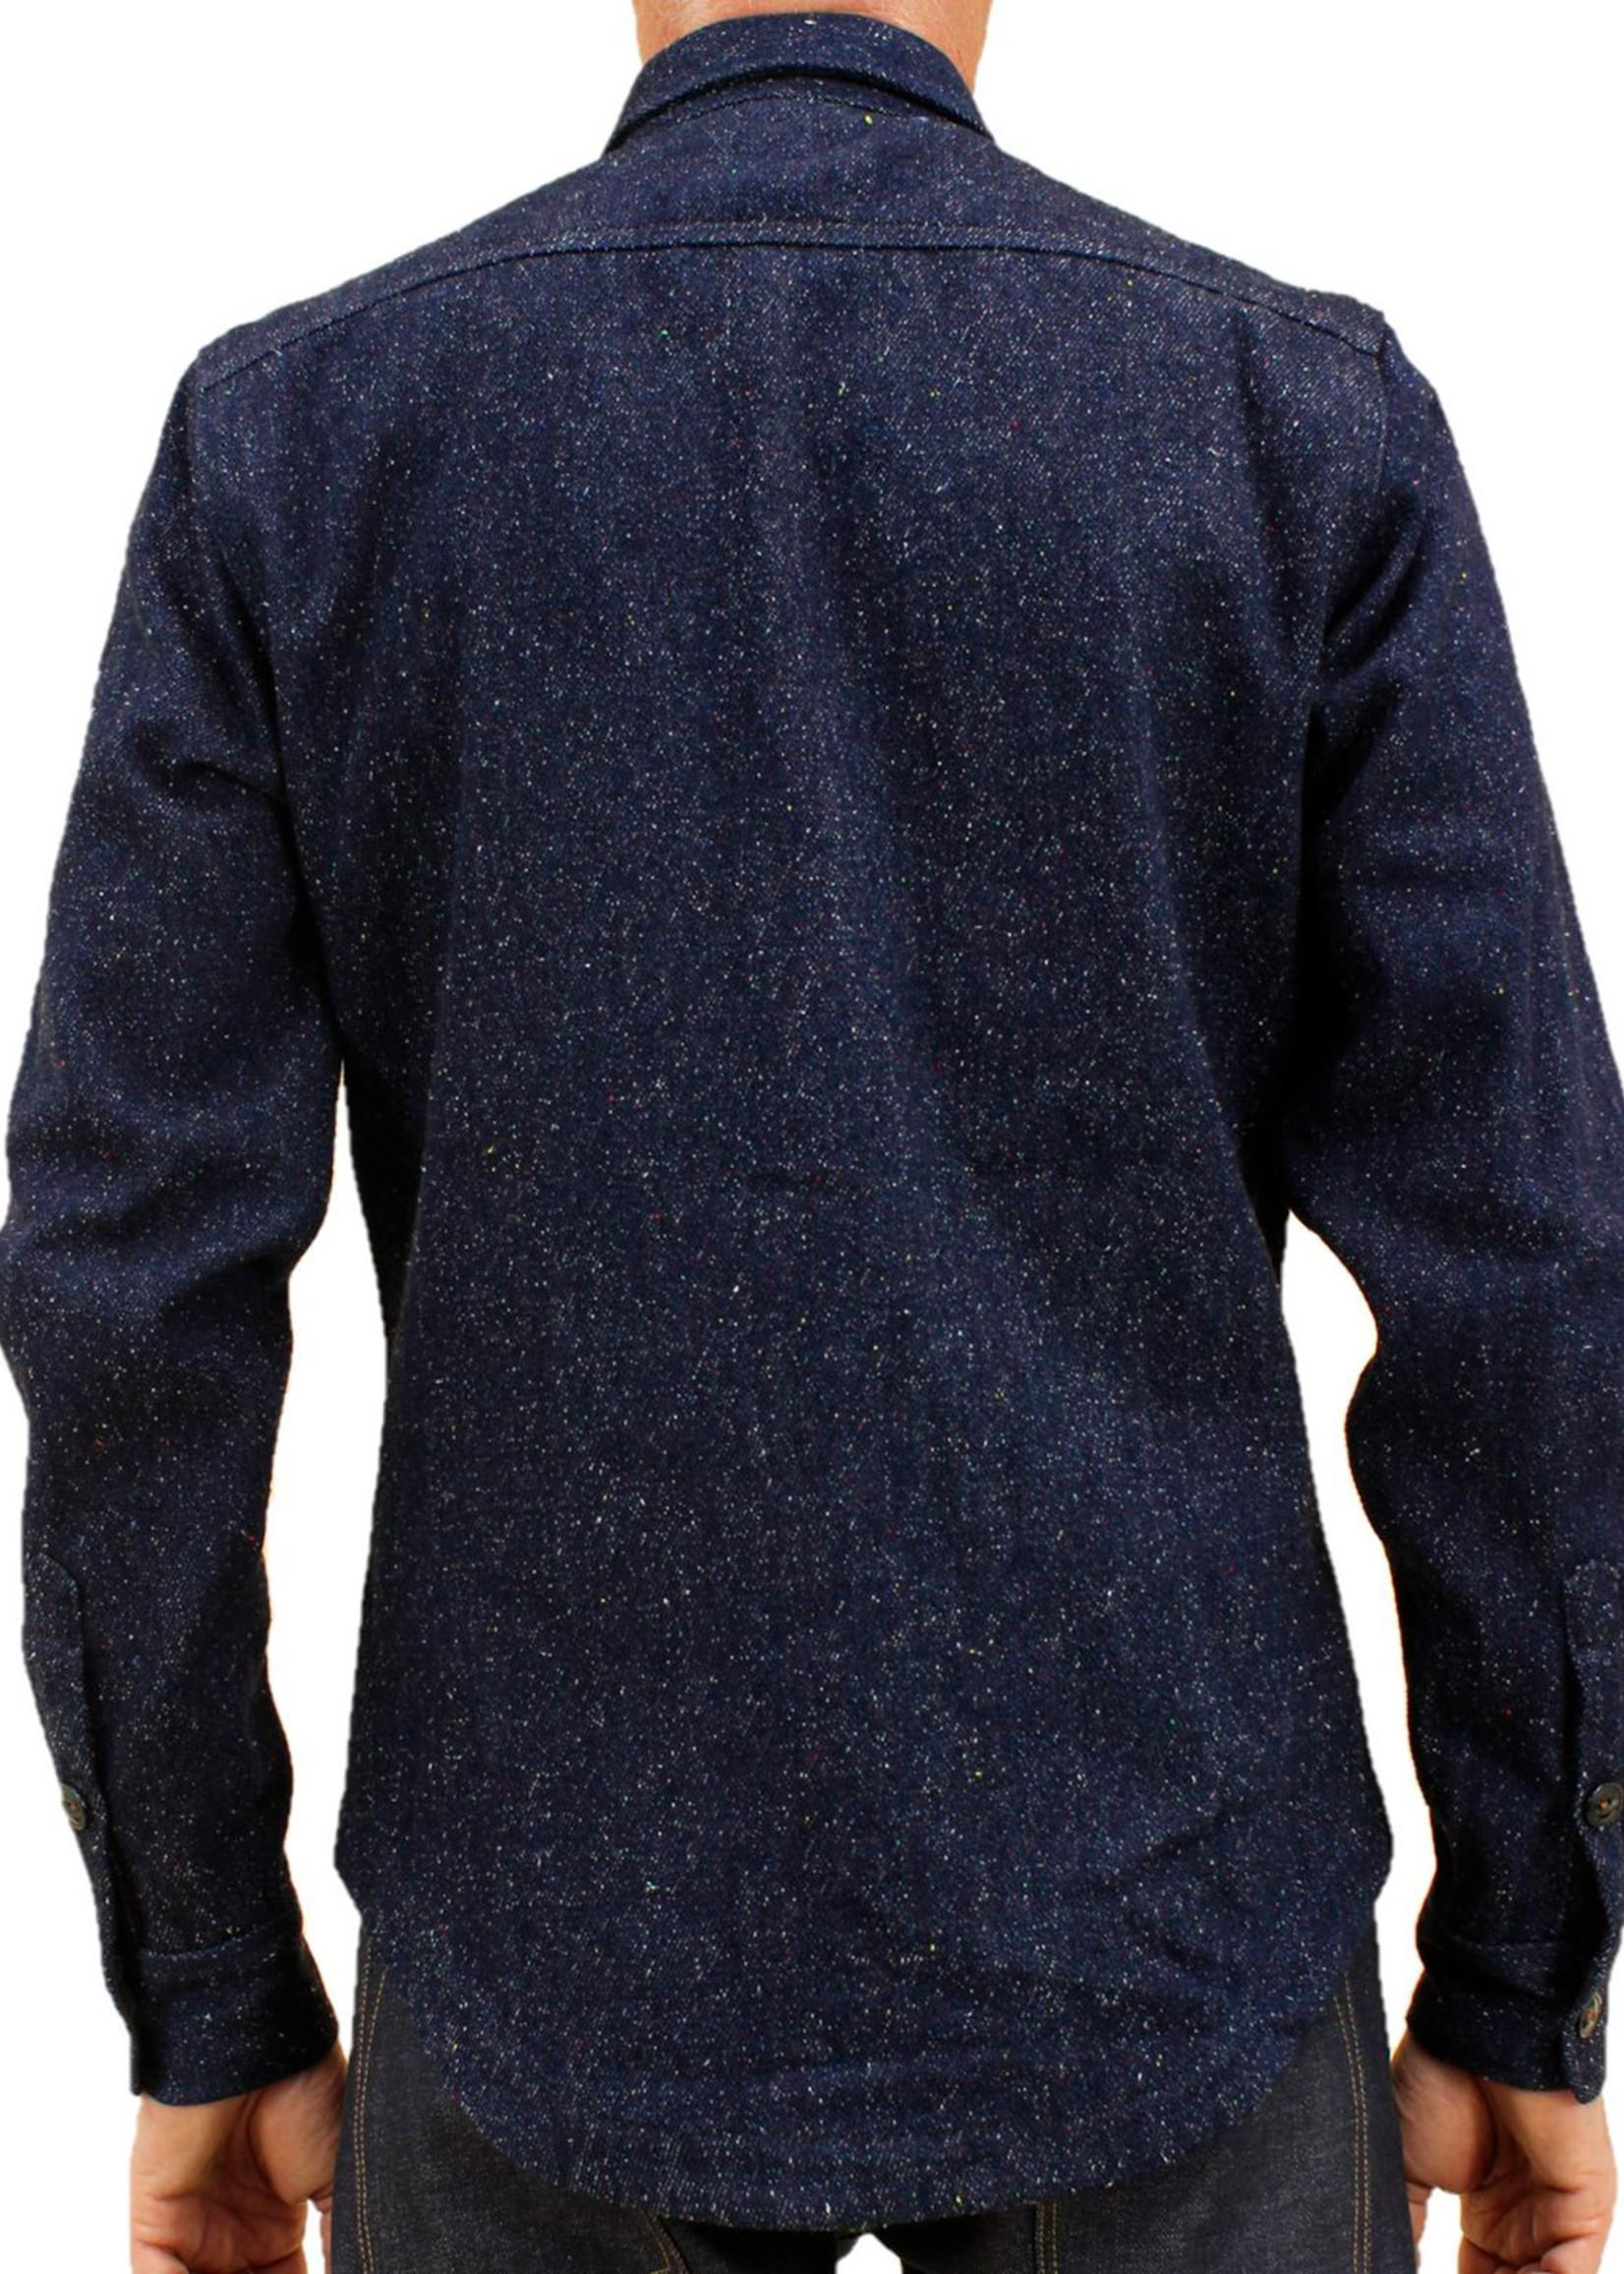 Kato Kato Anvil Shirt Jacket Indigo Raw (0010-401-05)